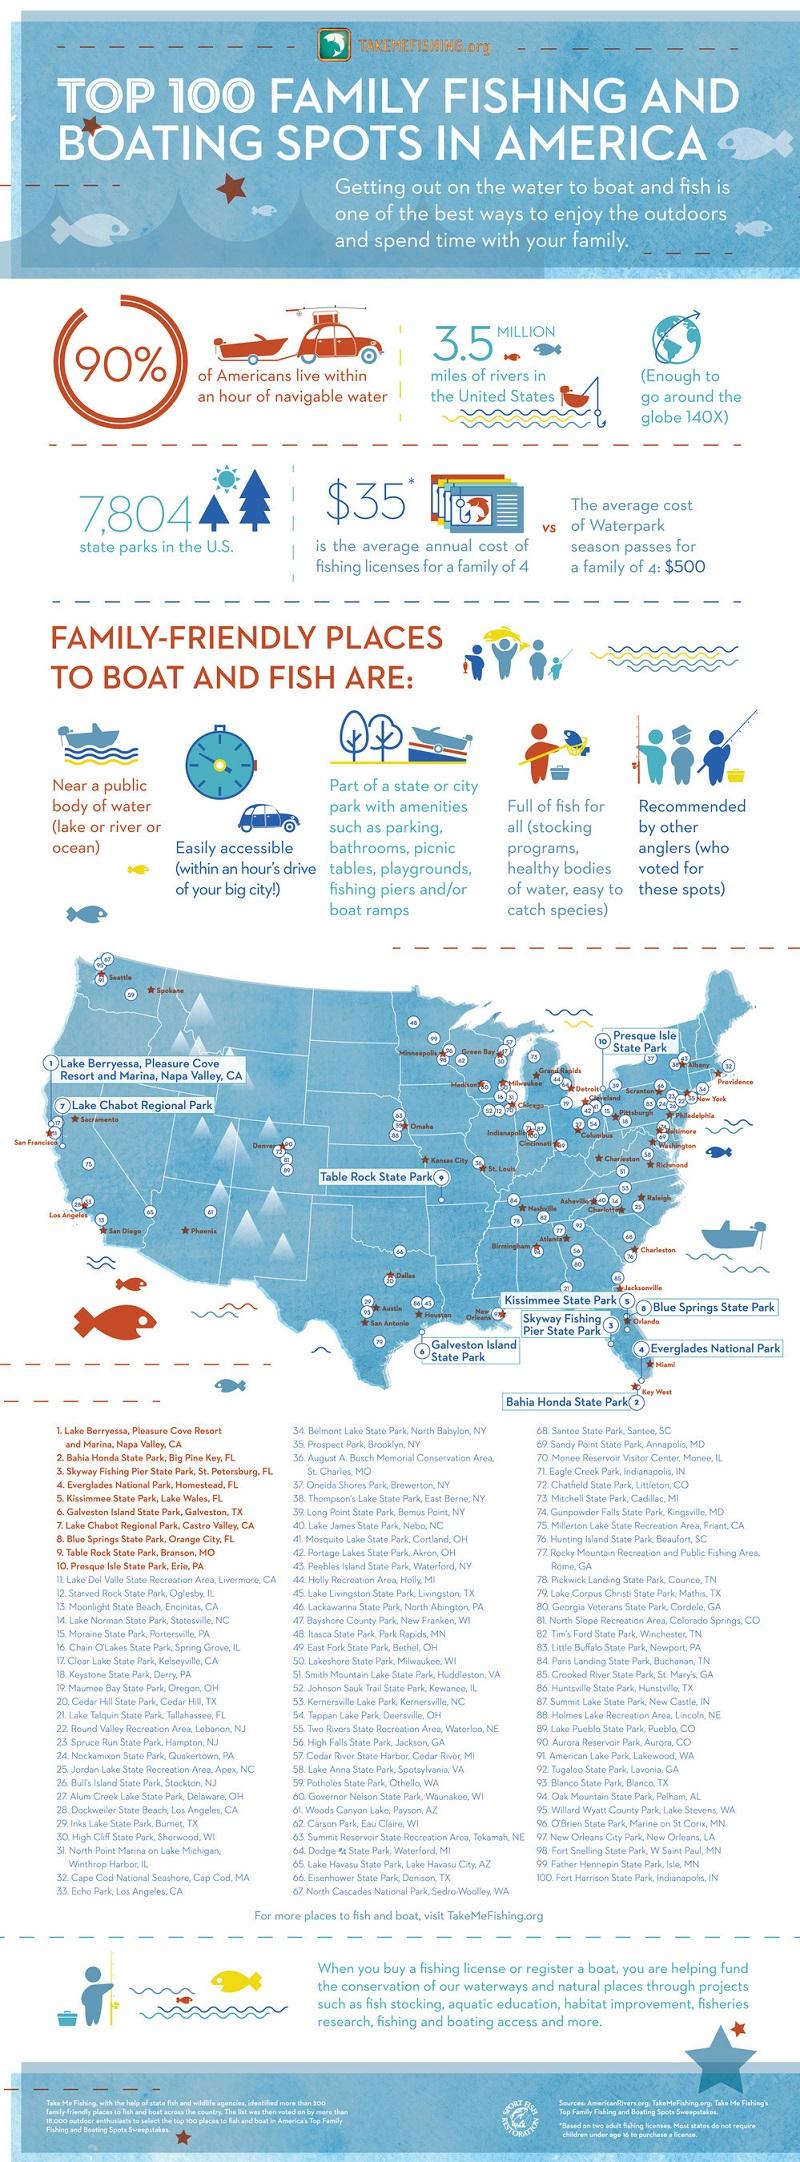 Take me fishing announces america 39 s top 100 family for Take me fishing